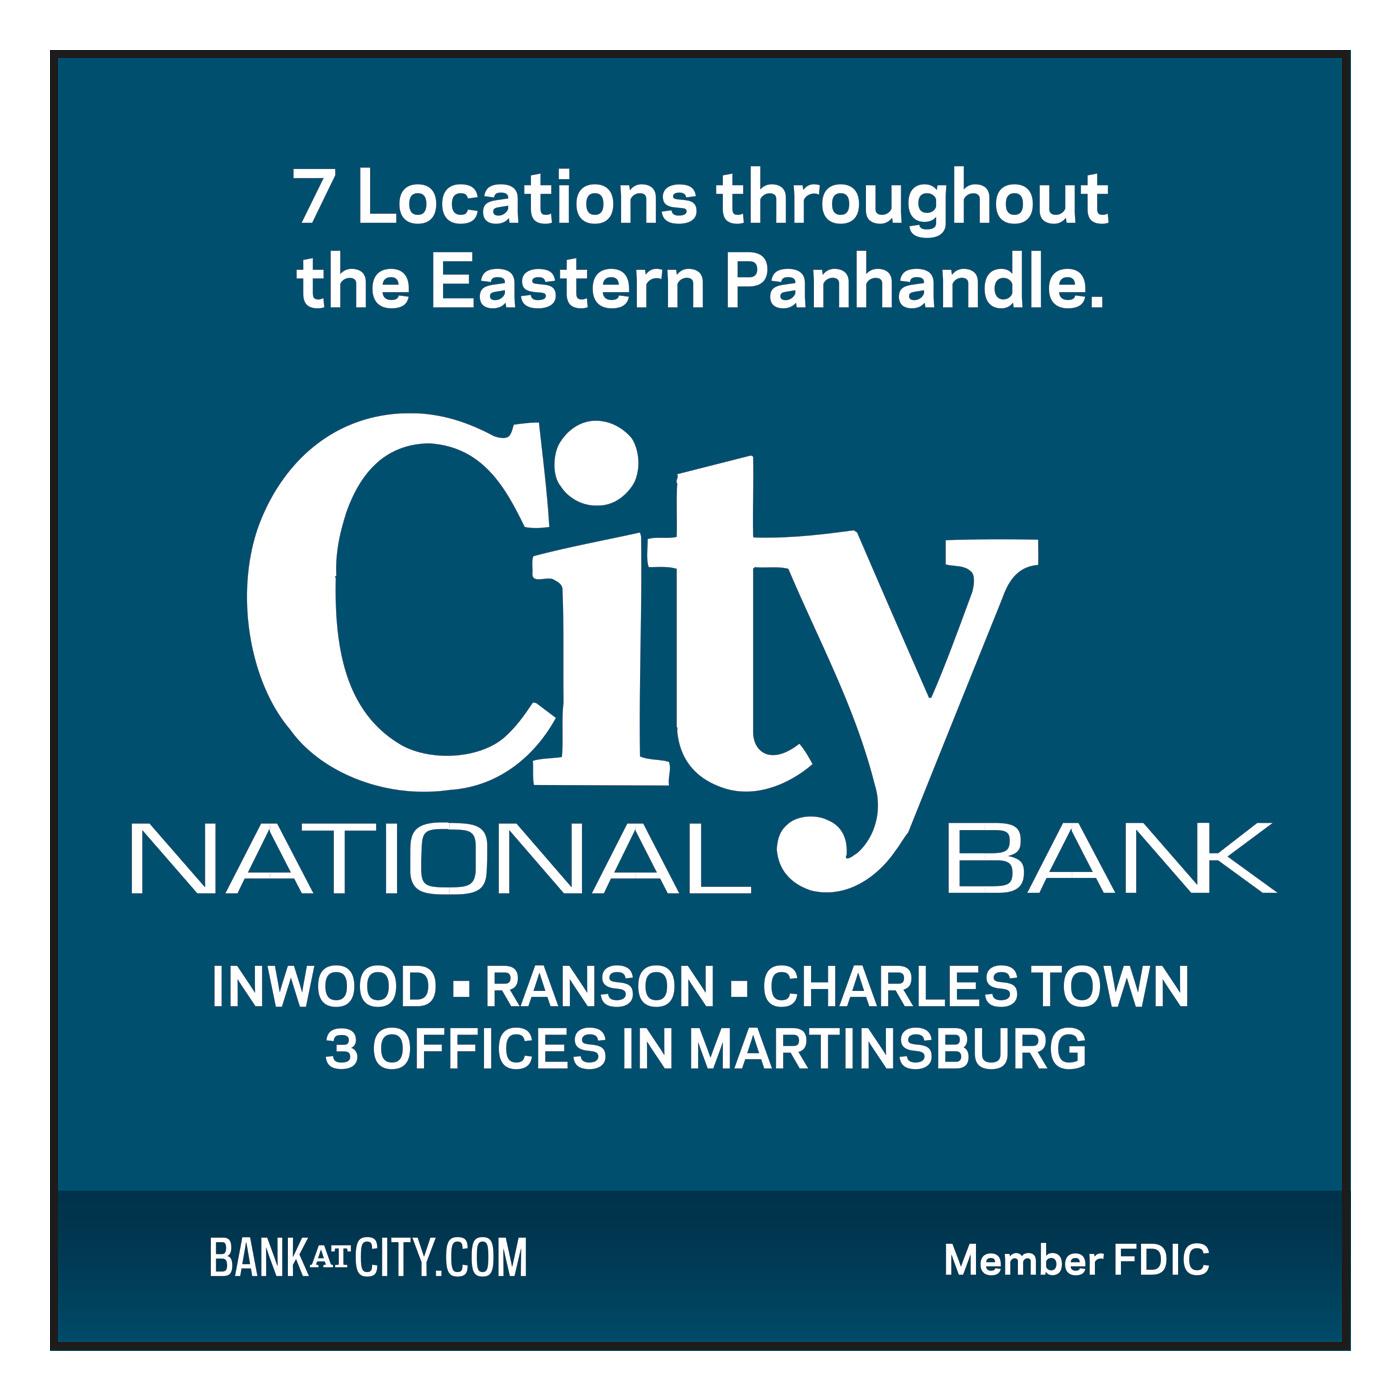 City National Bank 18 (1)